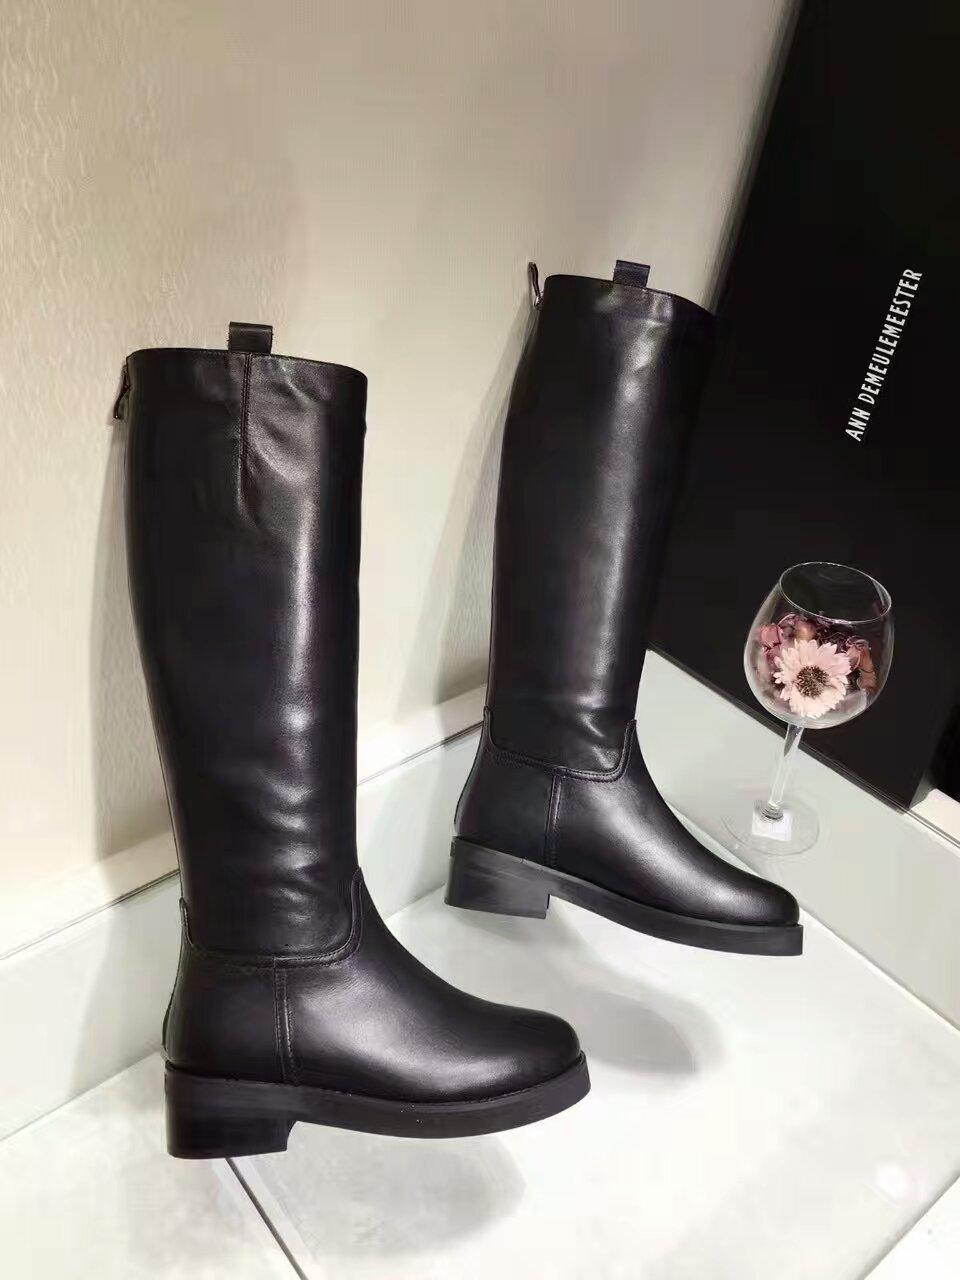 Ann demeulemeester经典款顶级版本 16FW 暗黑系爆款长靴_机车靴